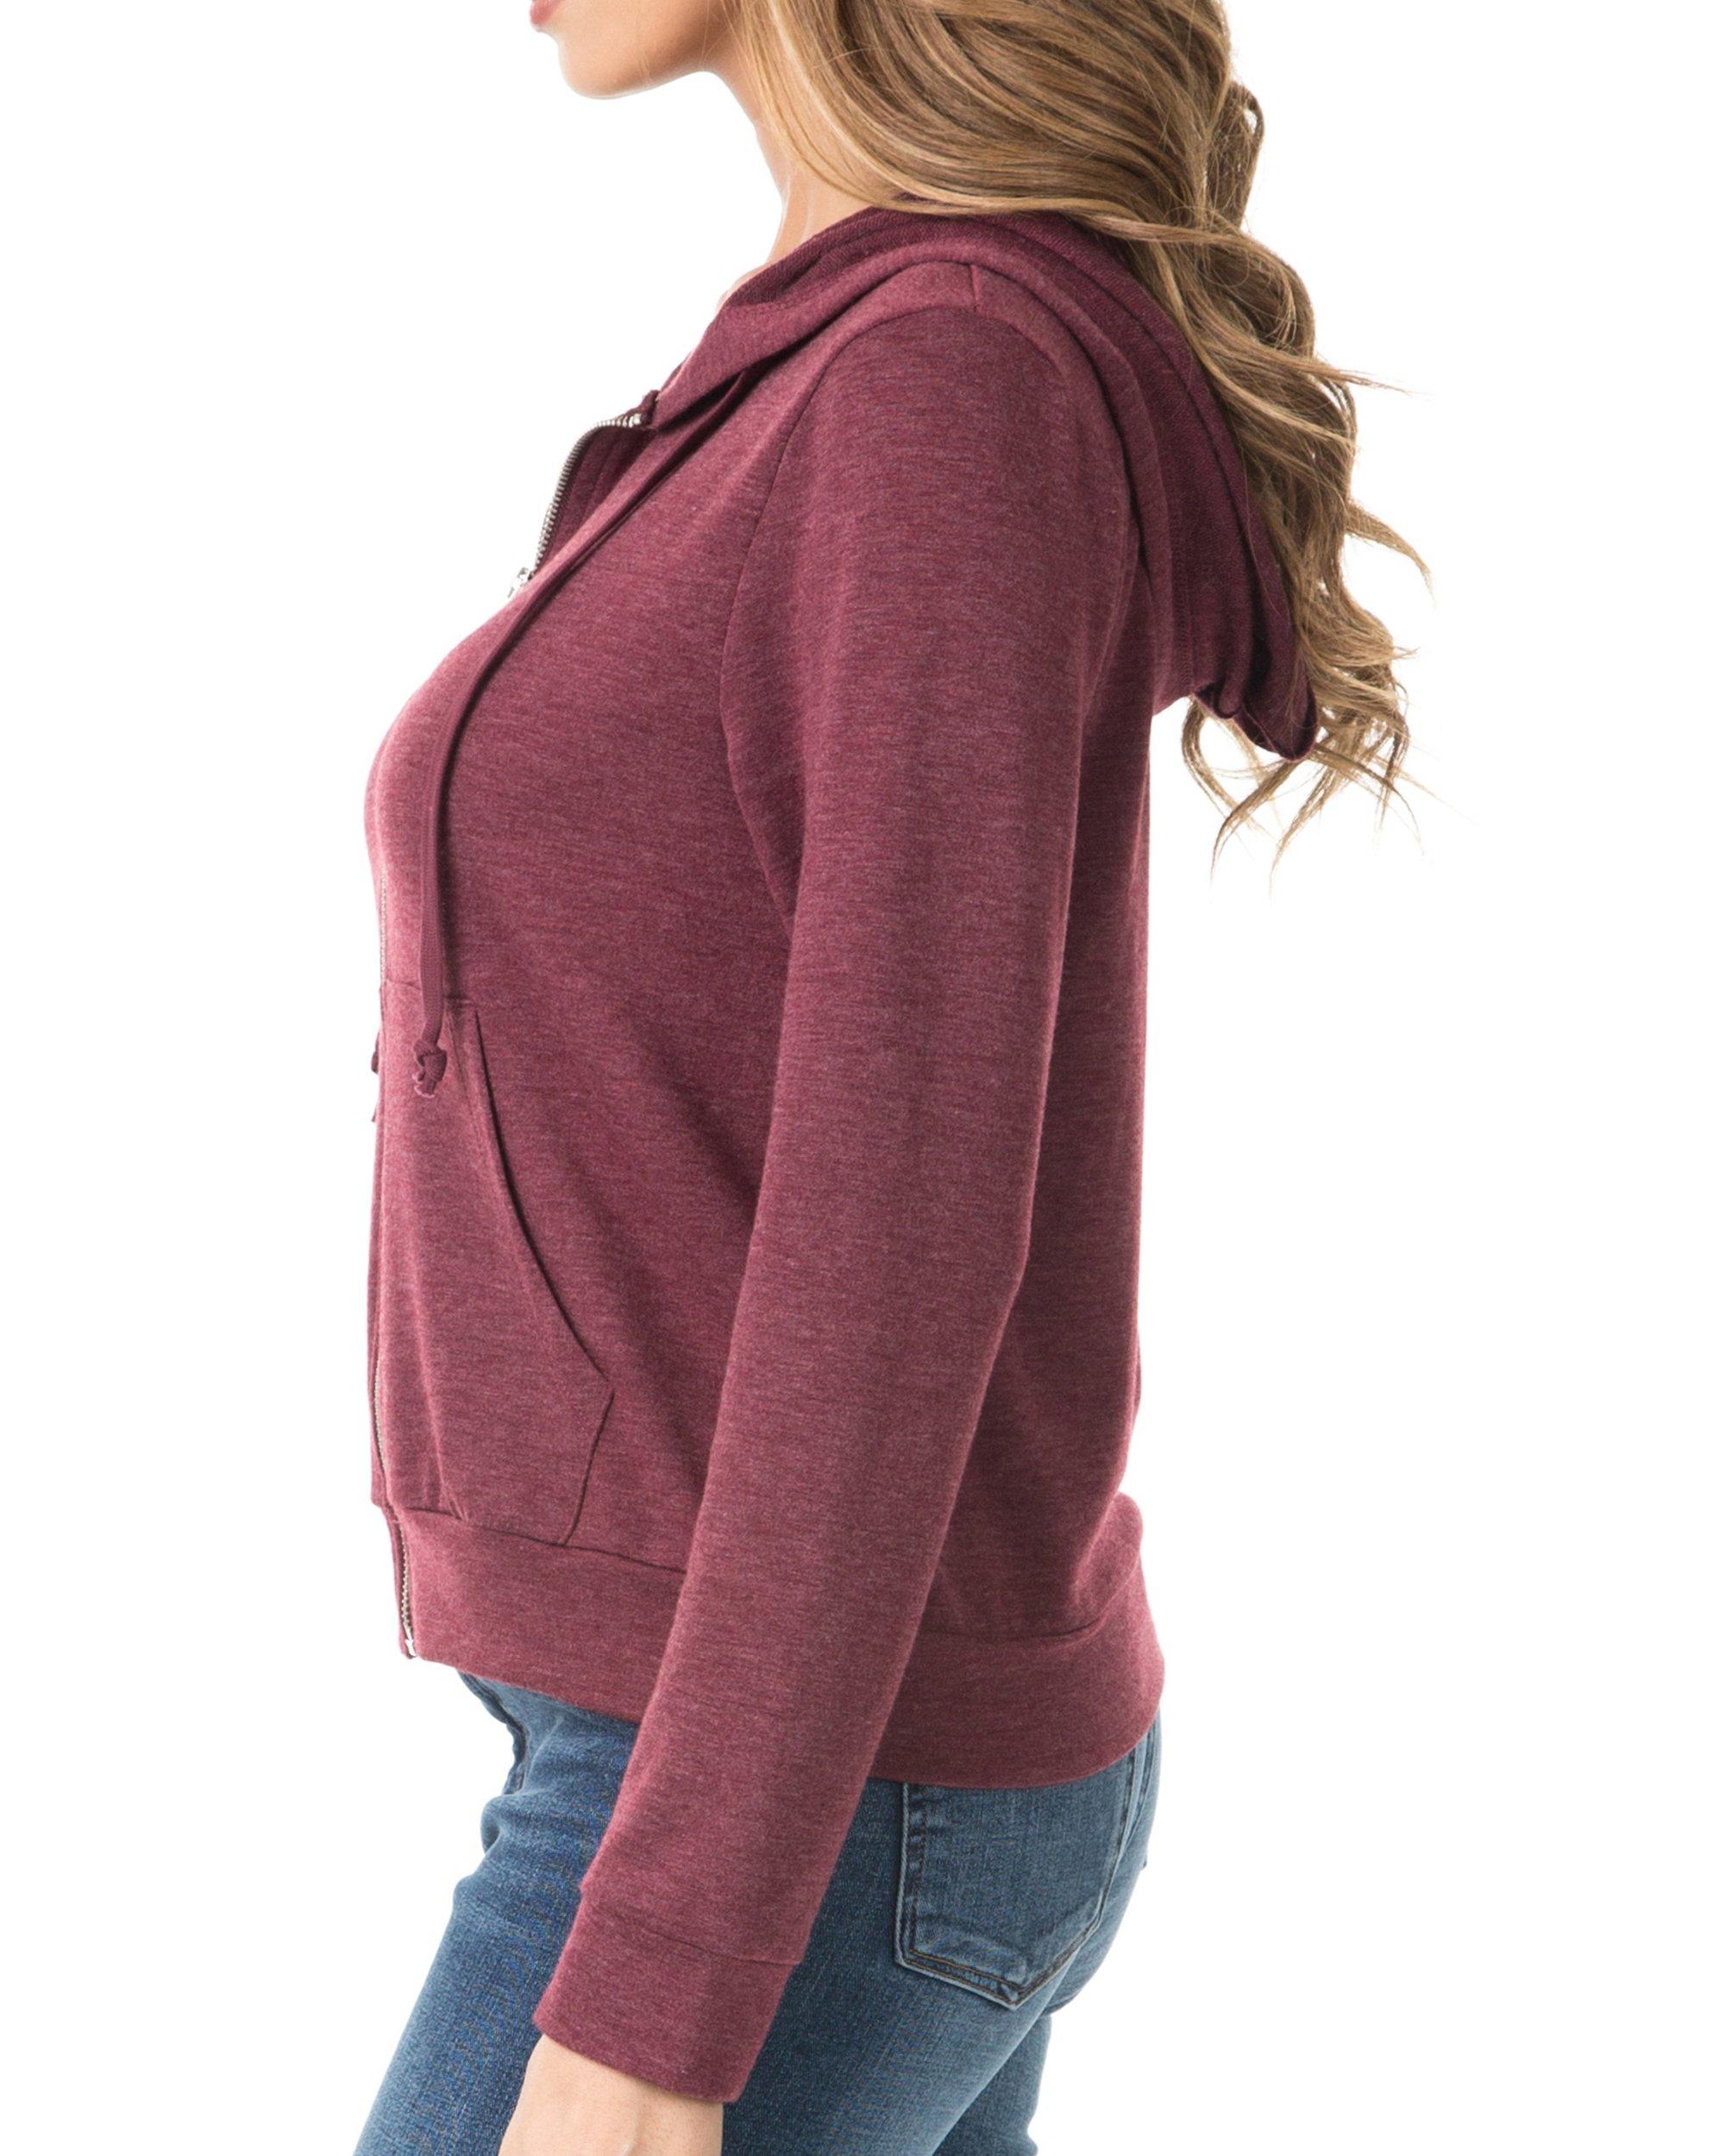 Nolabel B7_032 Women's Long Sleeve French Terry Drawstring Hoodies Zip Up Sweatshirt Hooded (Burgundy/5XL) by Nolabel (Image #2)